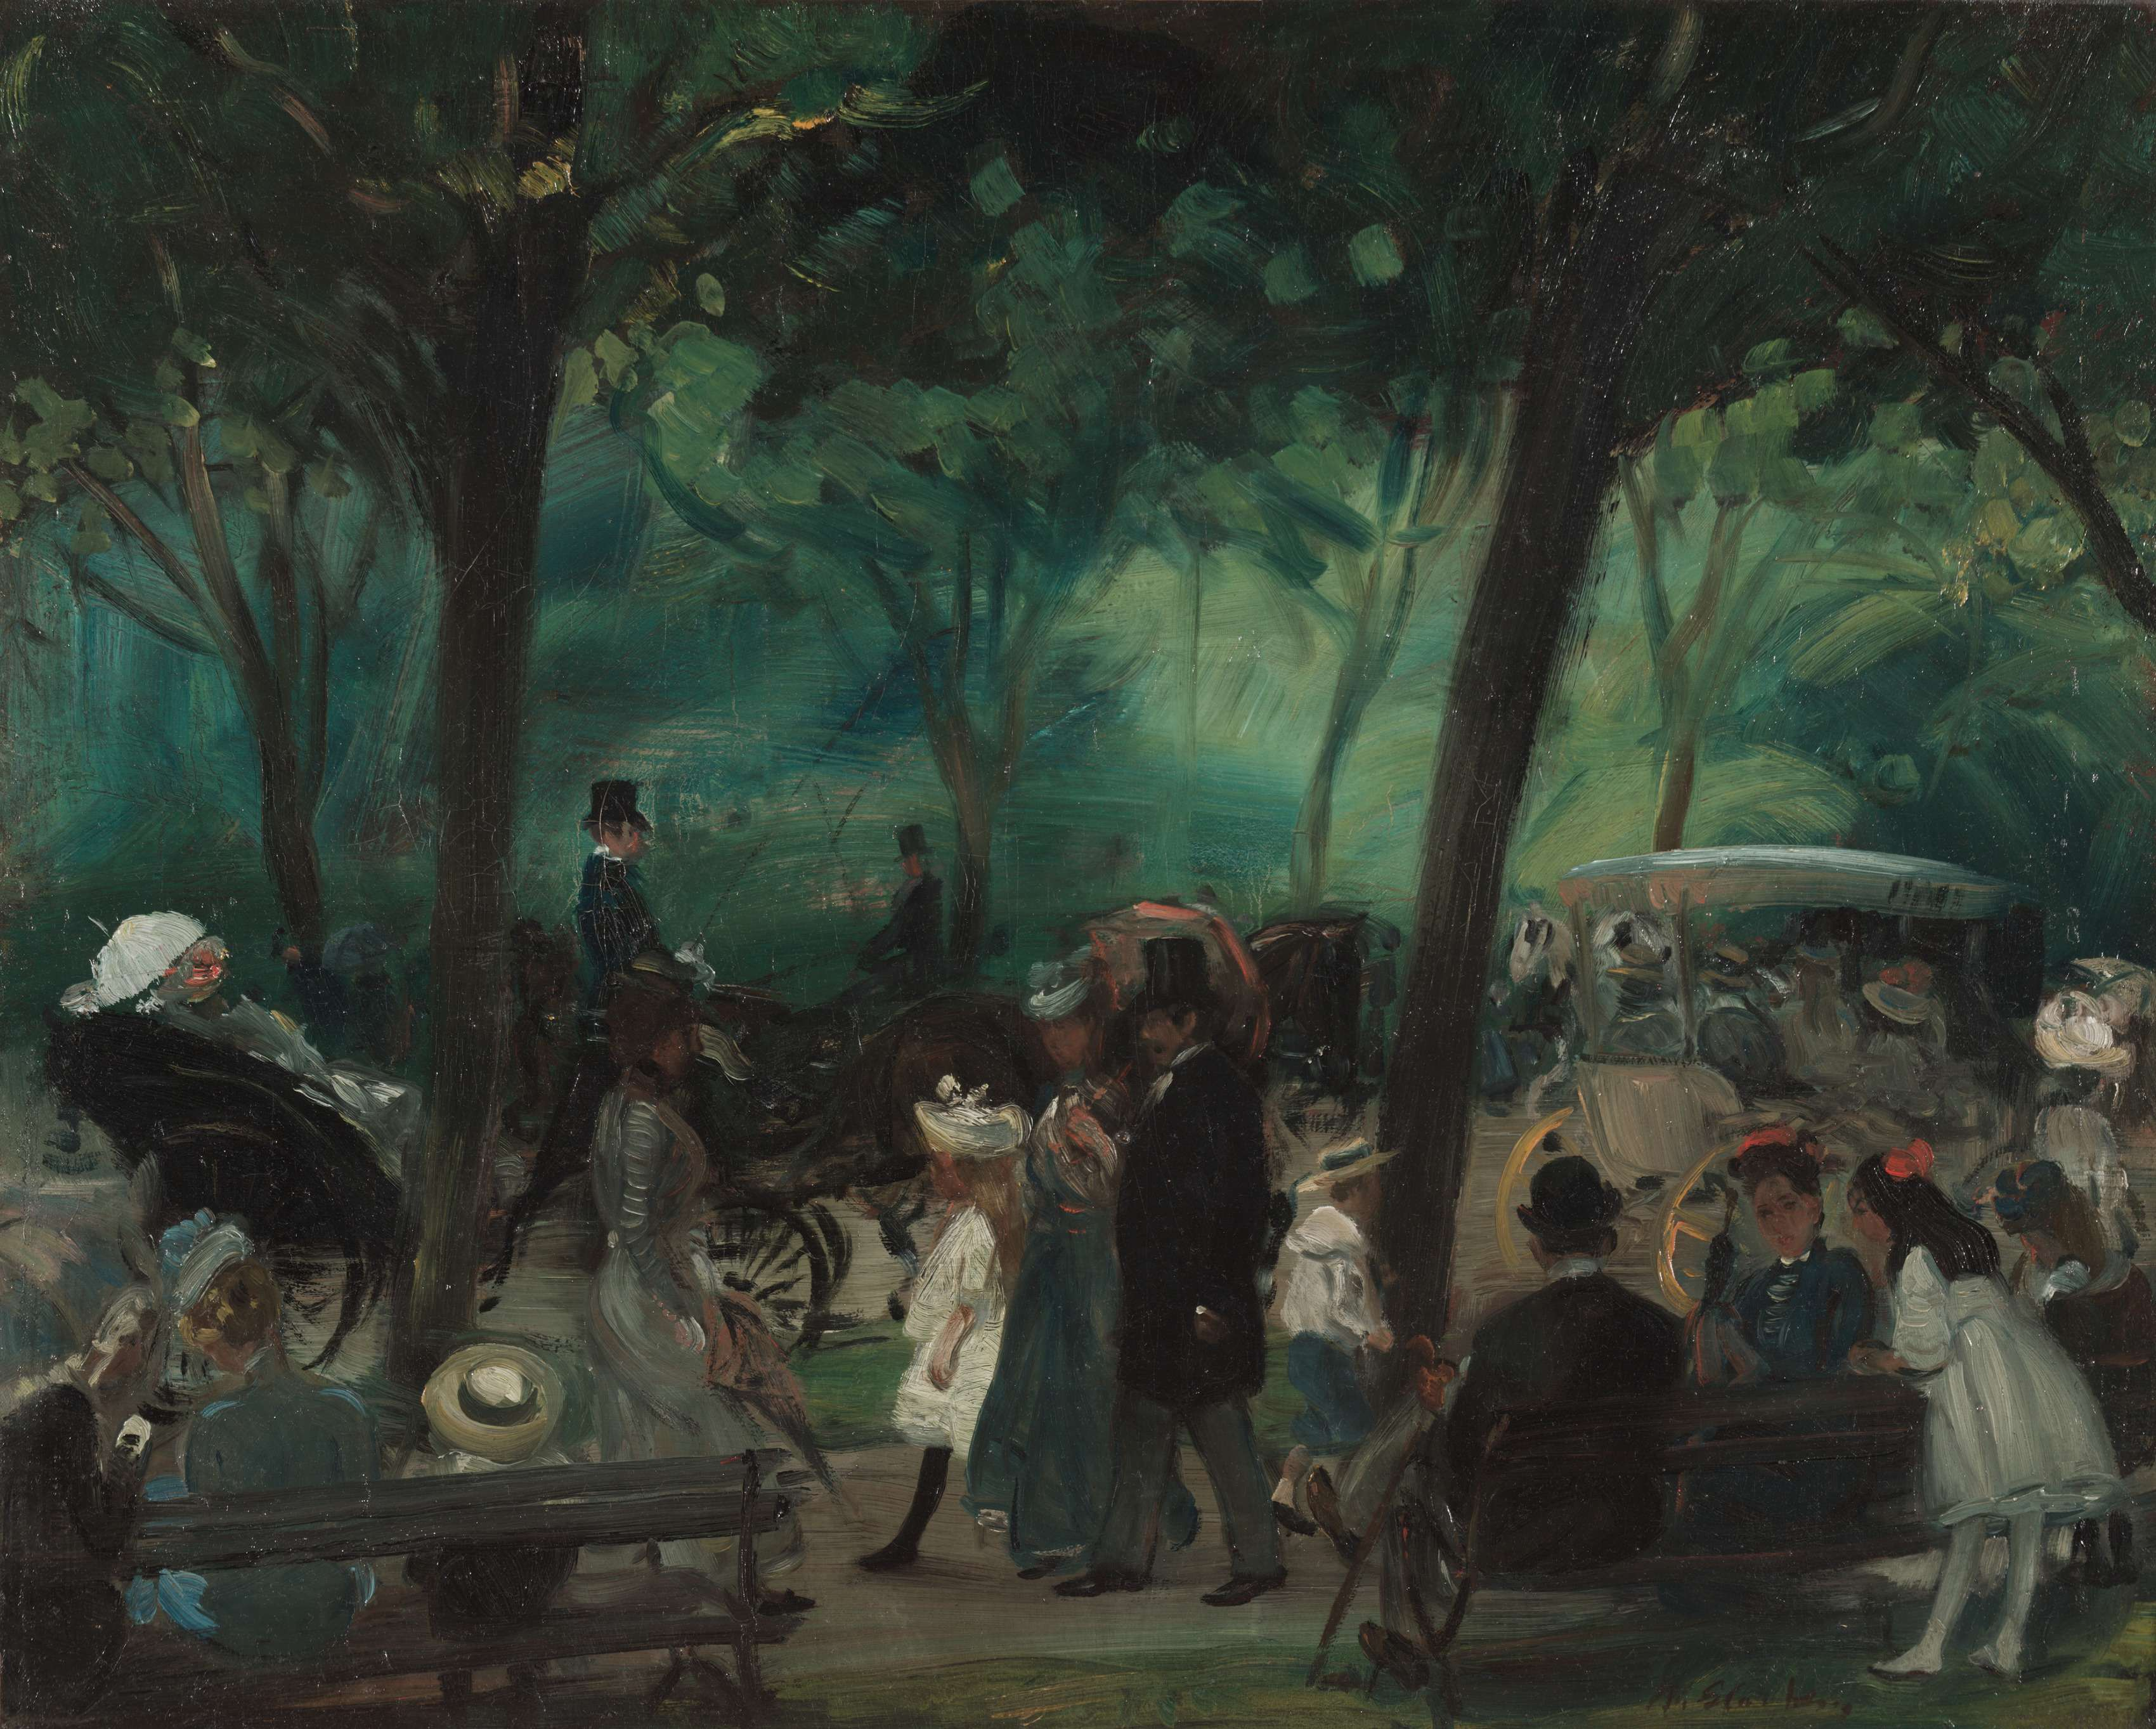 The Drive, Central Park c. 1905. William Glackens. (American, 1870-1938). Μουσείο Τέχνης του Κλίβελαντ.